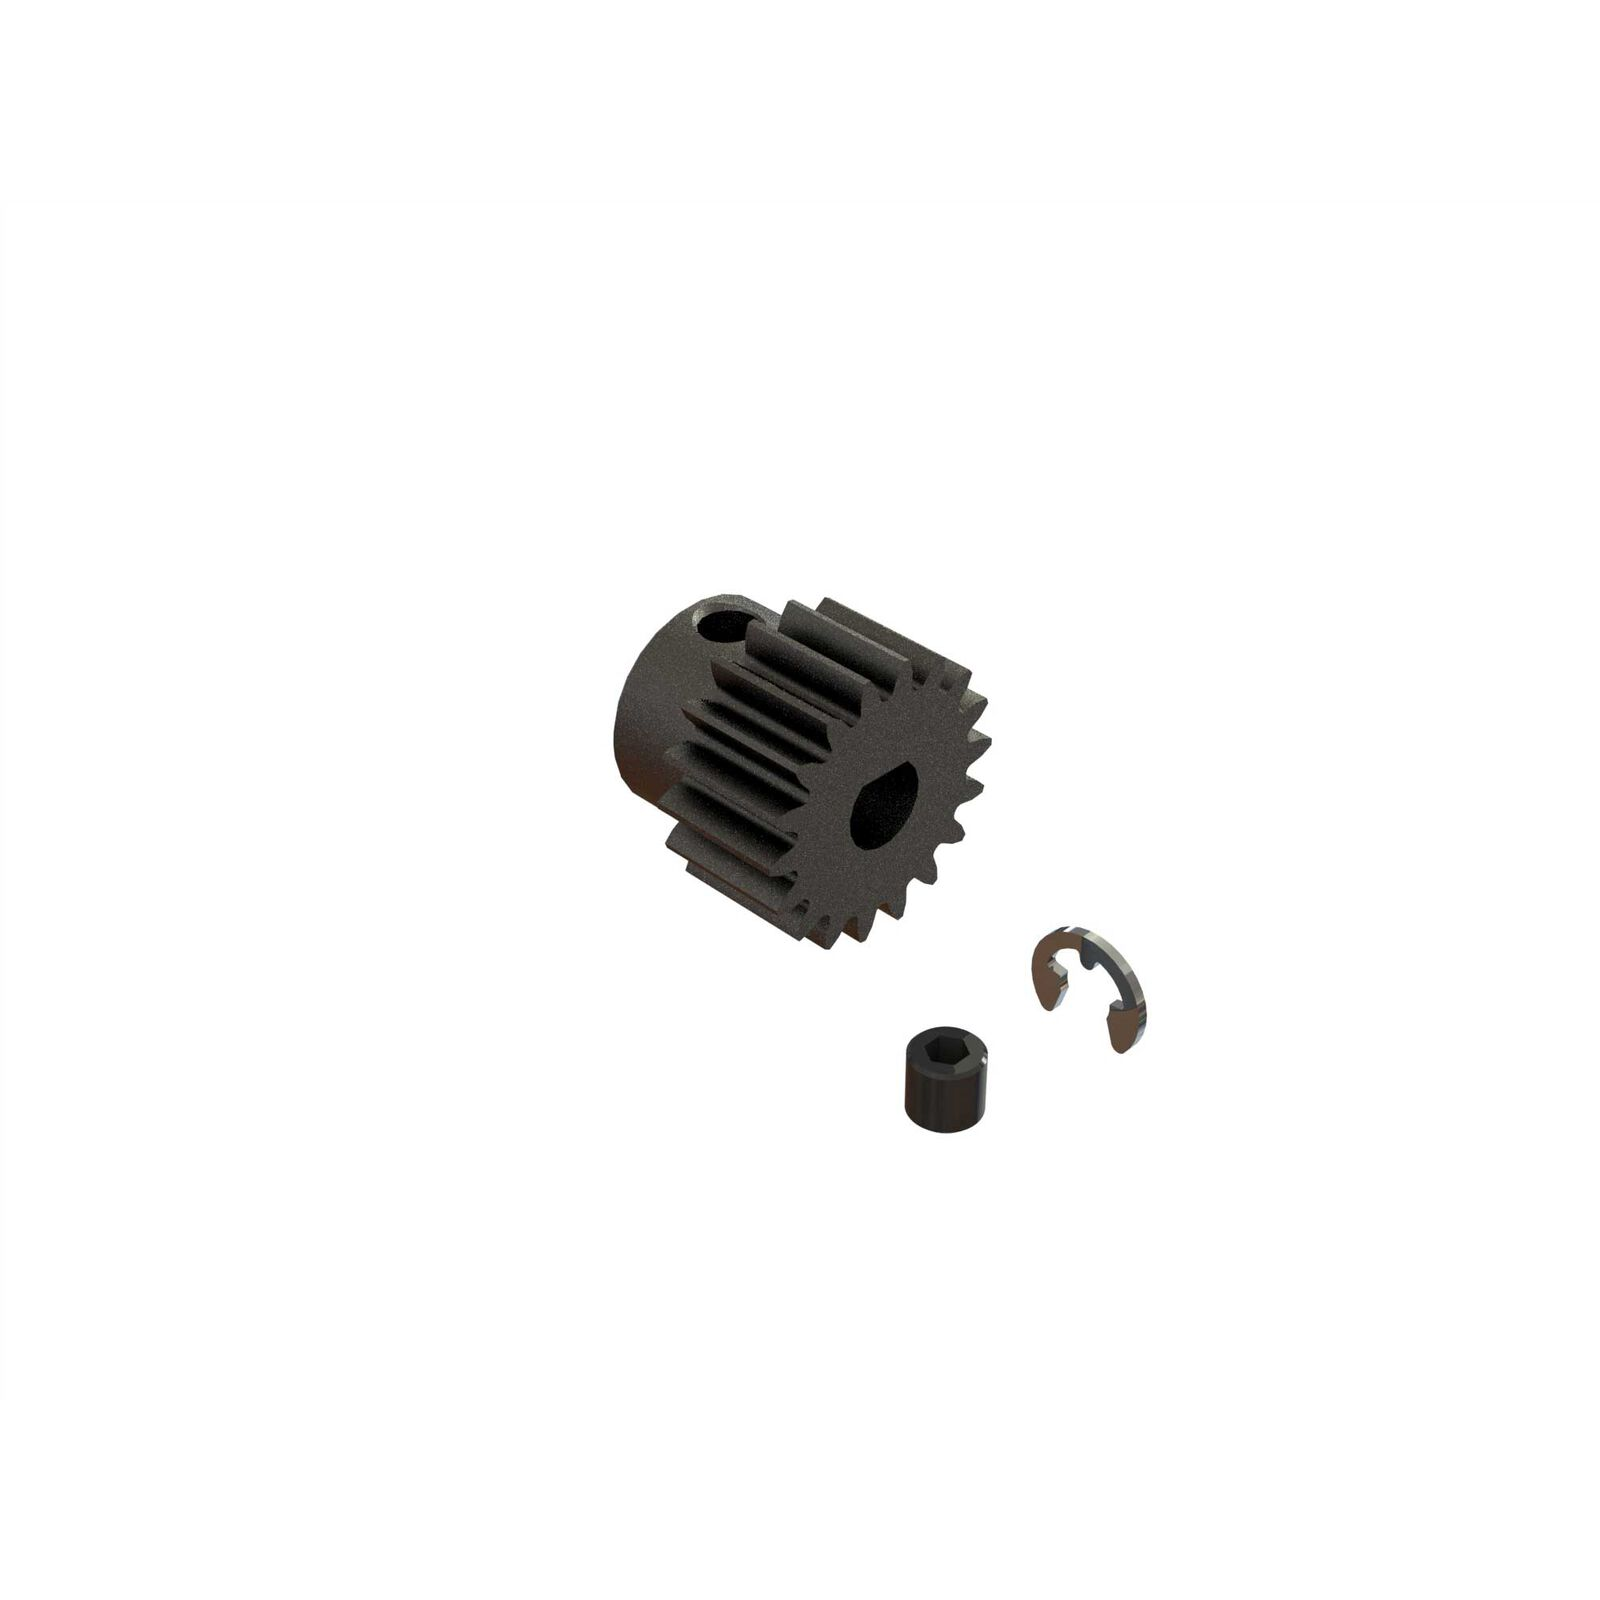 19T 0.8Mod Safe-D5 Pinion Gear